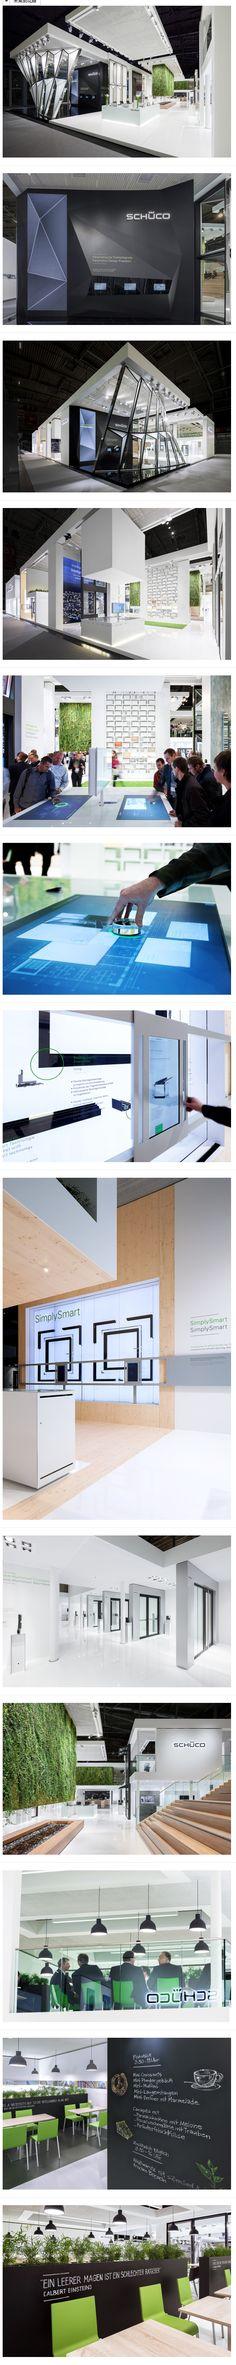 Schuco展览空间设计